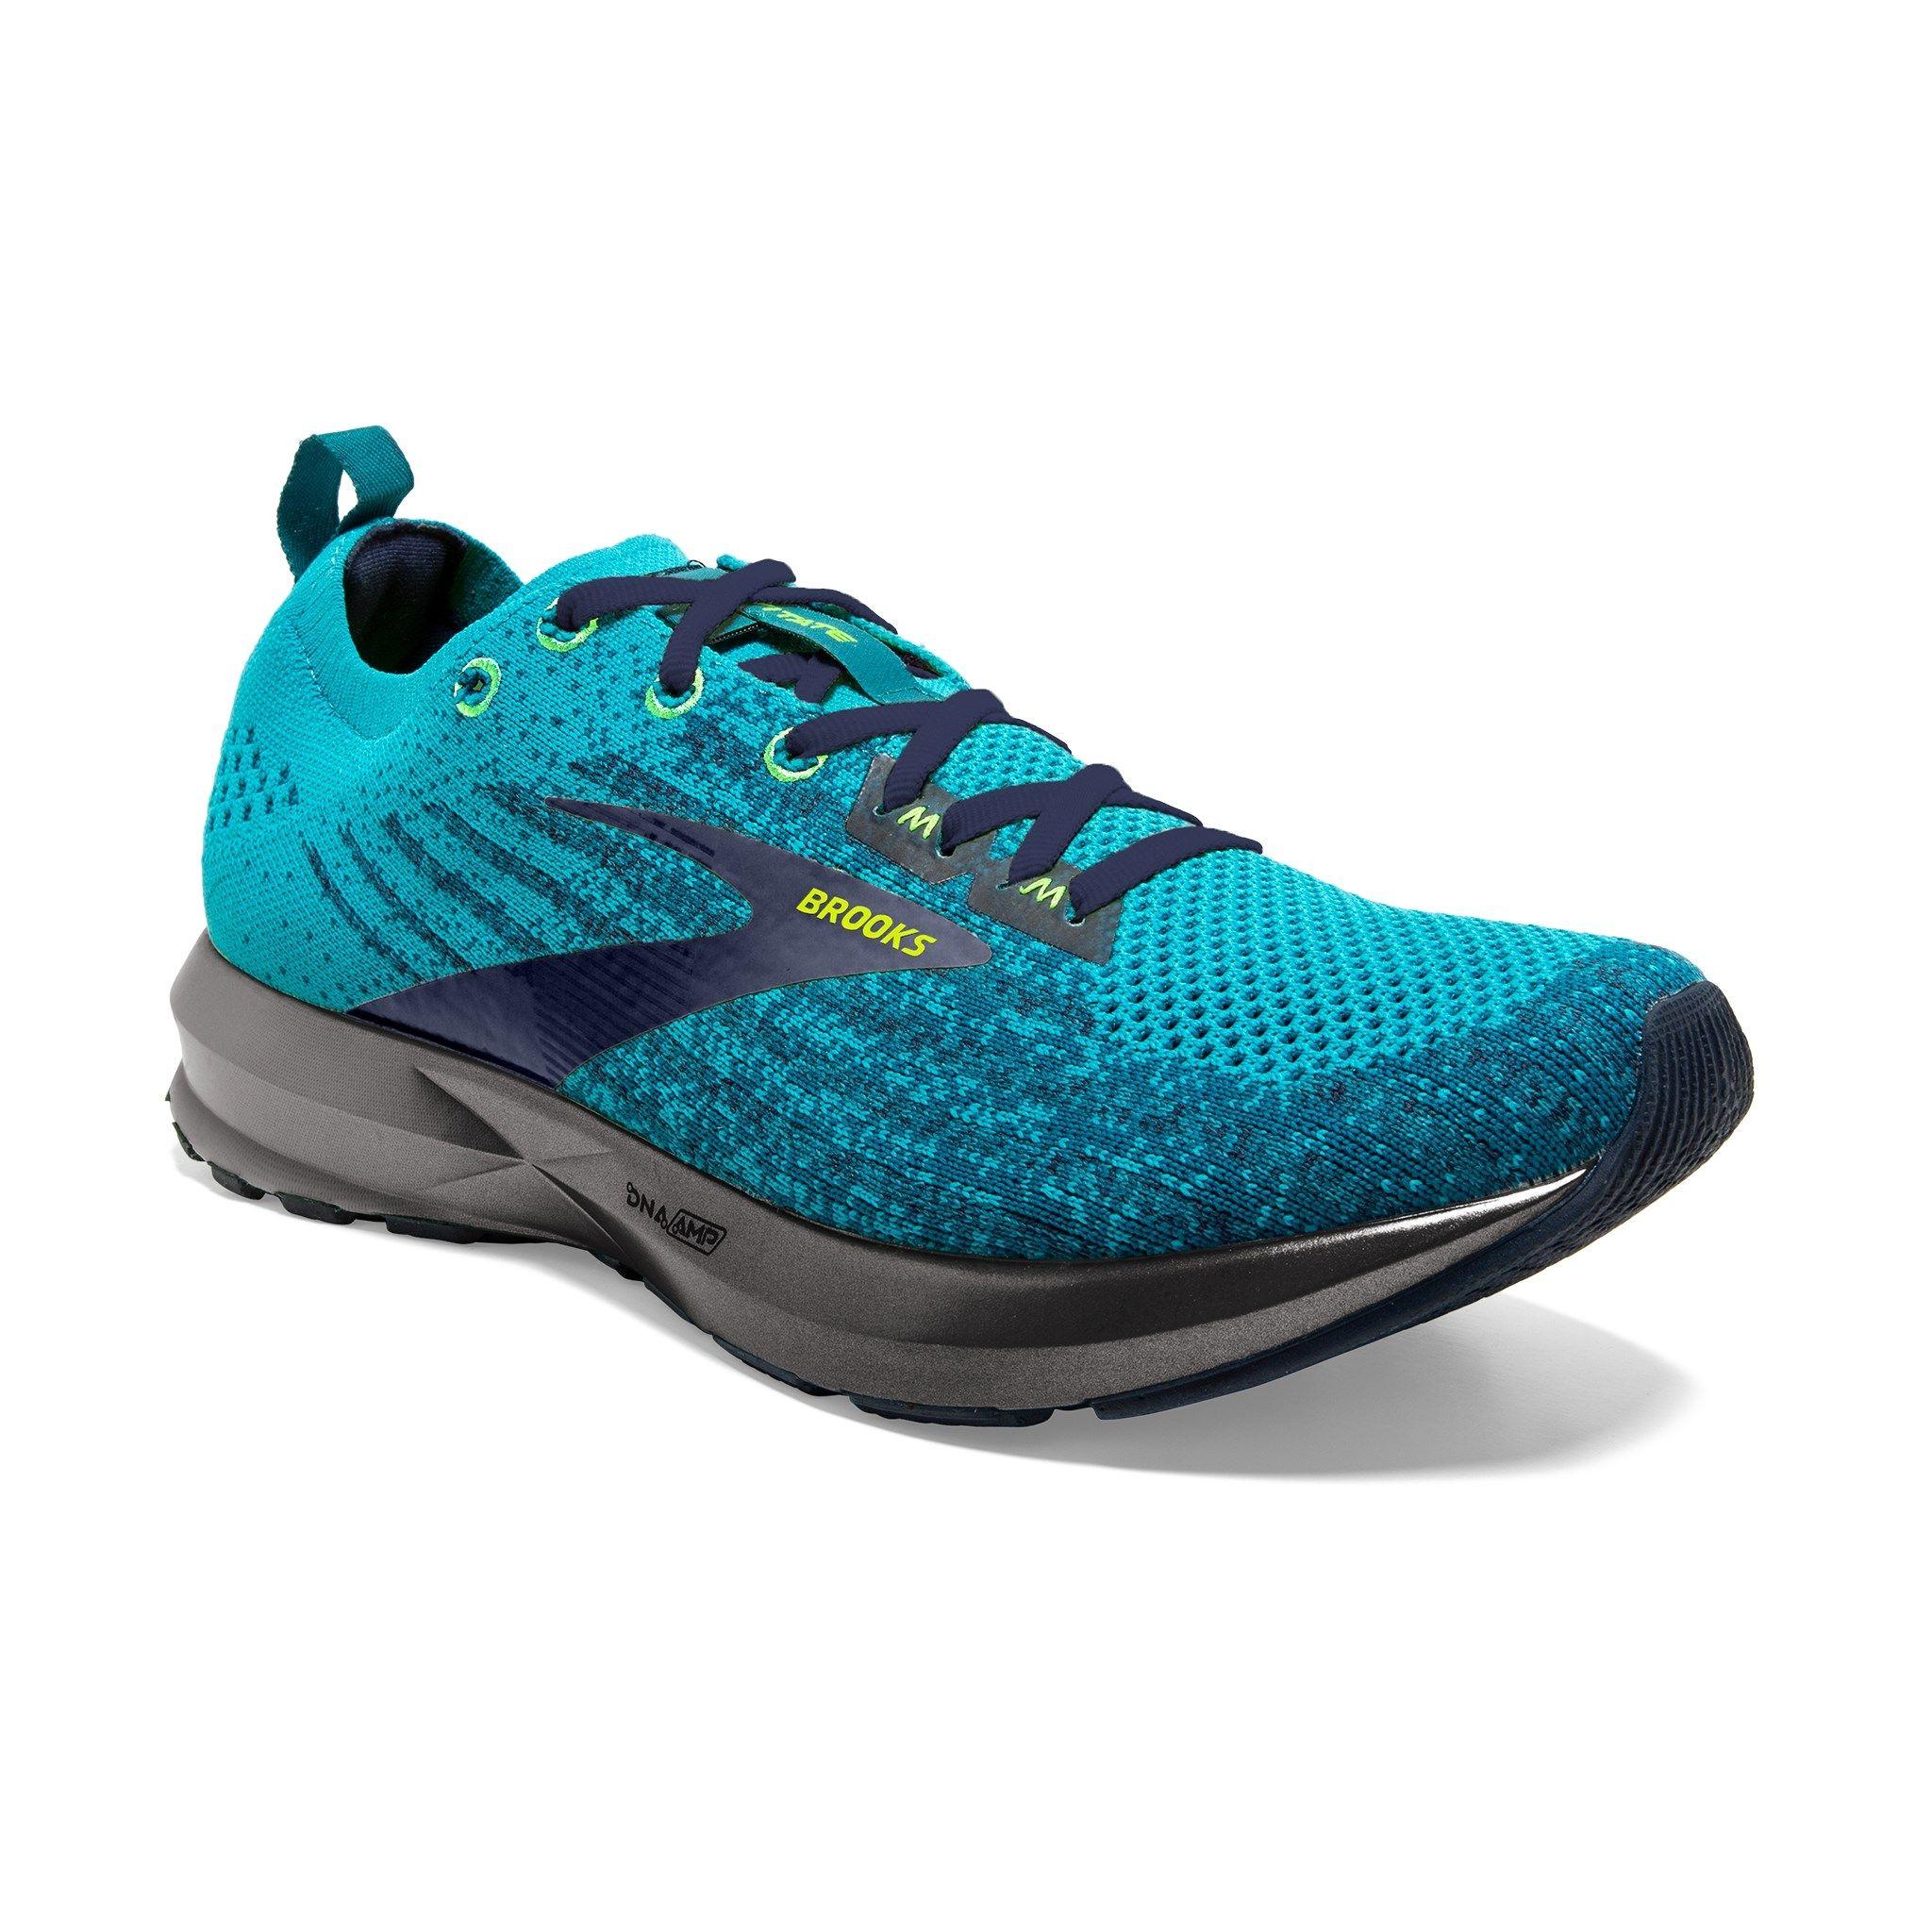 zapatillas running brooks neutras precio